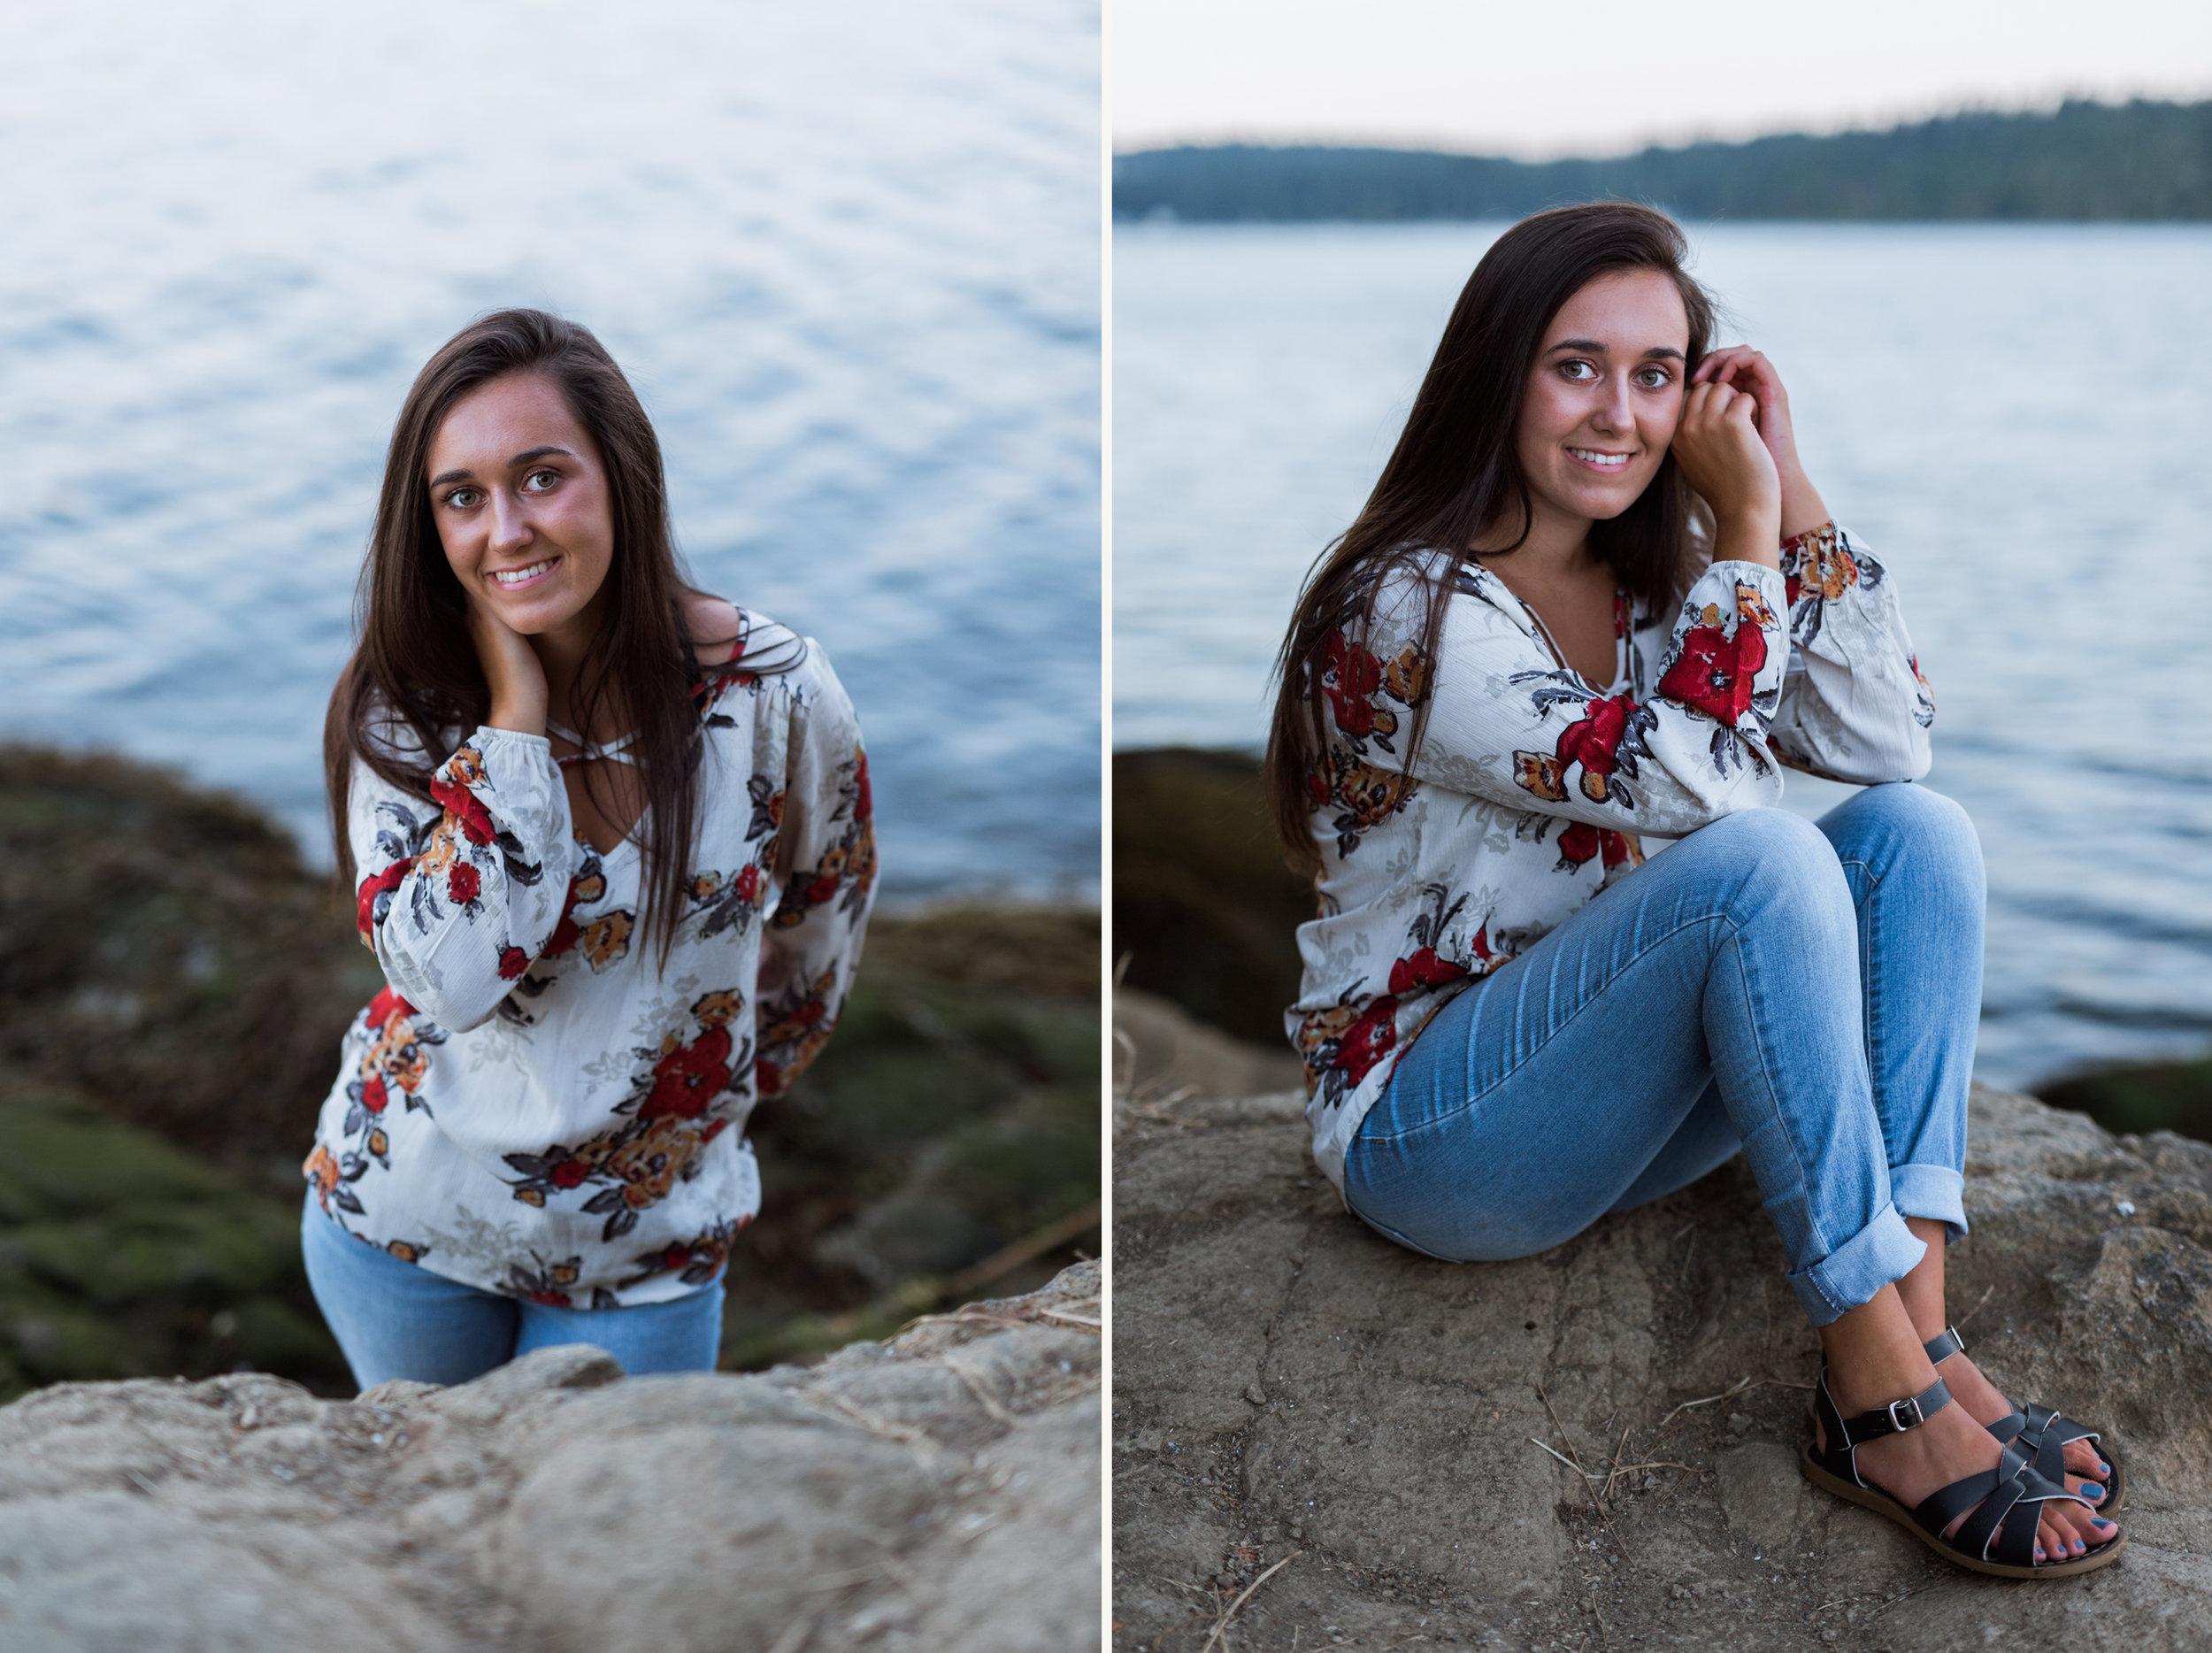 Grace | Senior Rep